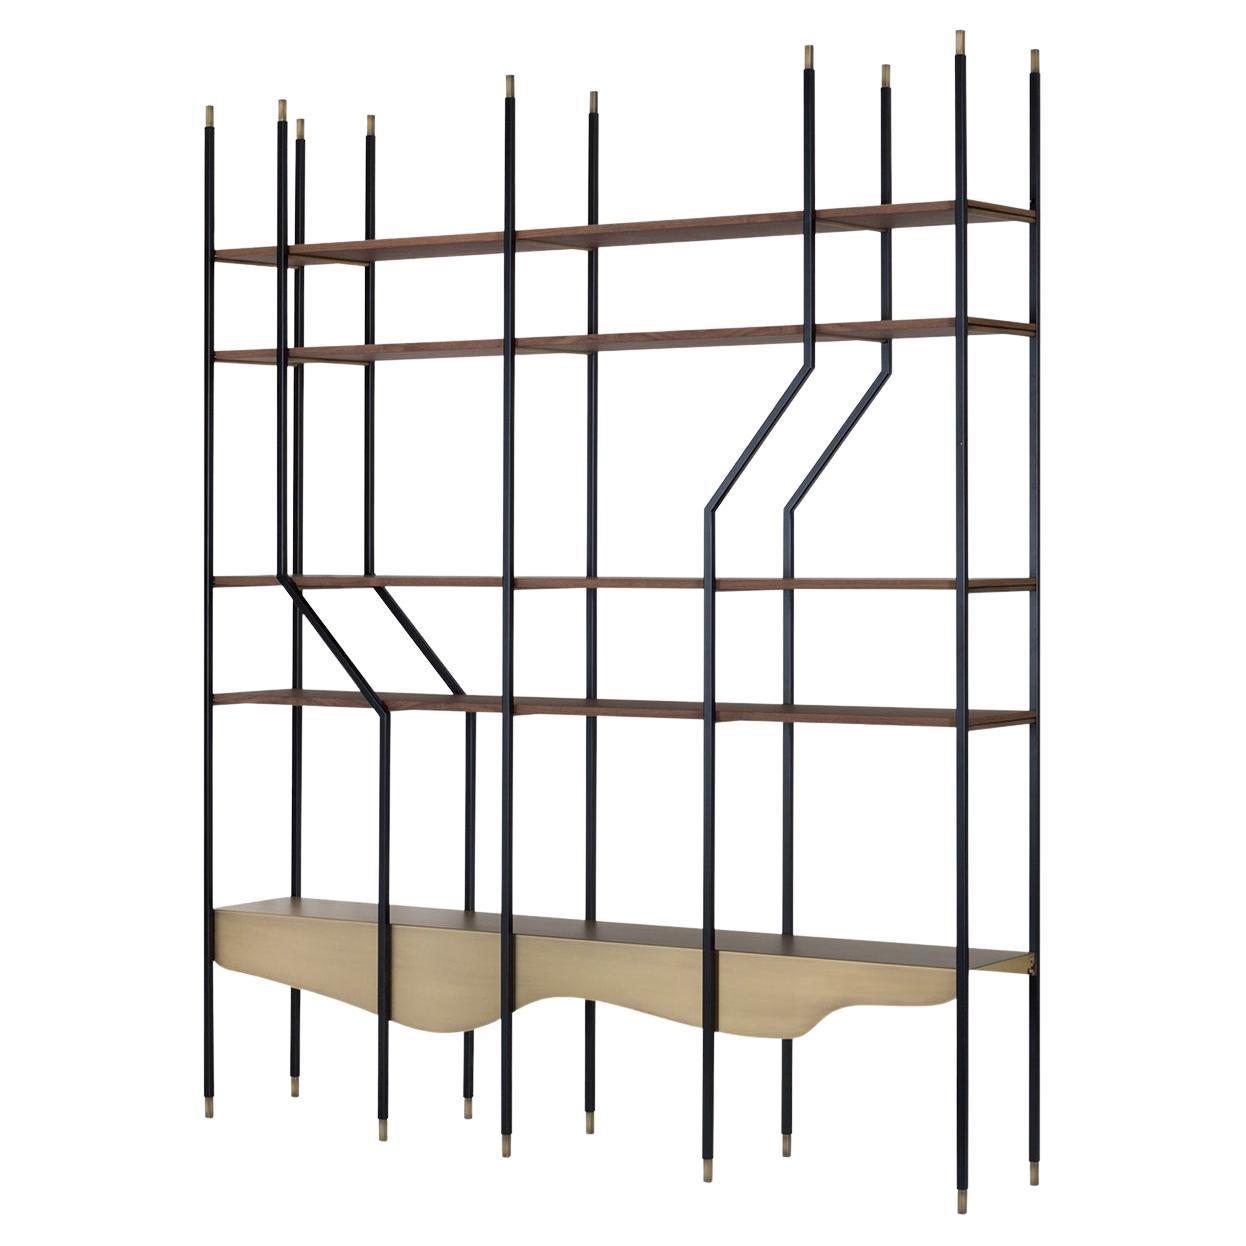 Lage Bookcase Matt Walnut Veneer Dark Oxidized Brass Metal Black Lacquered